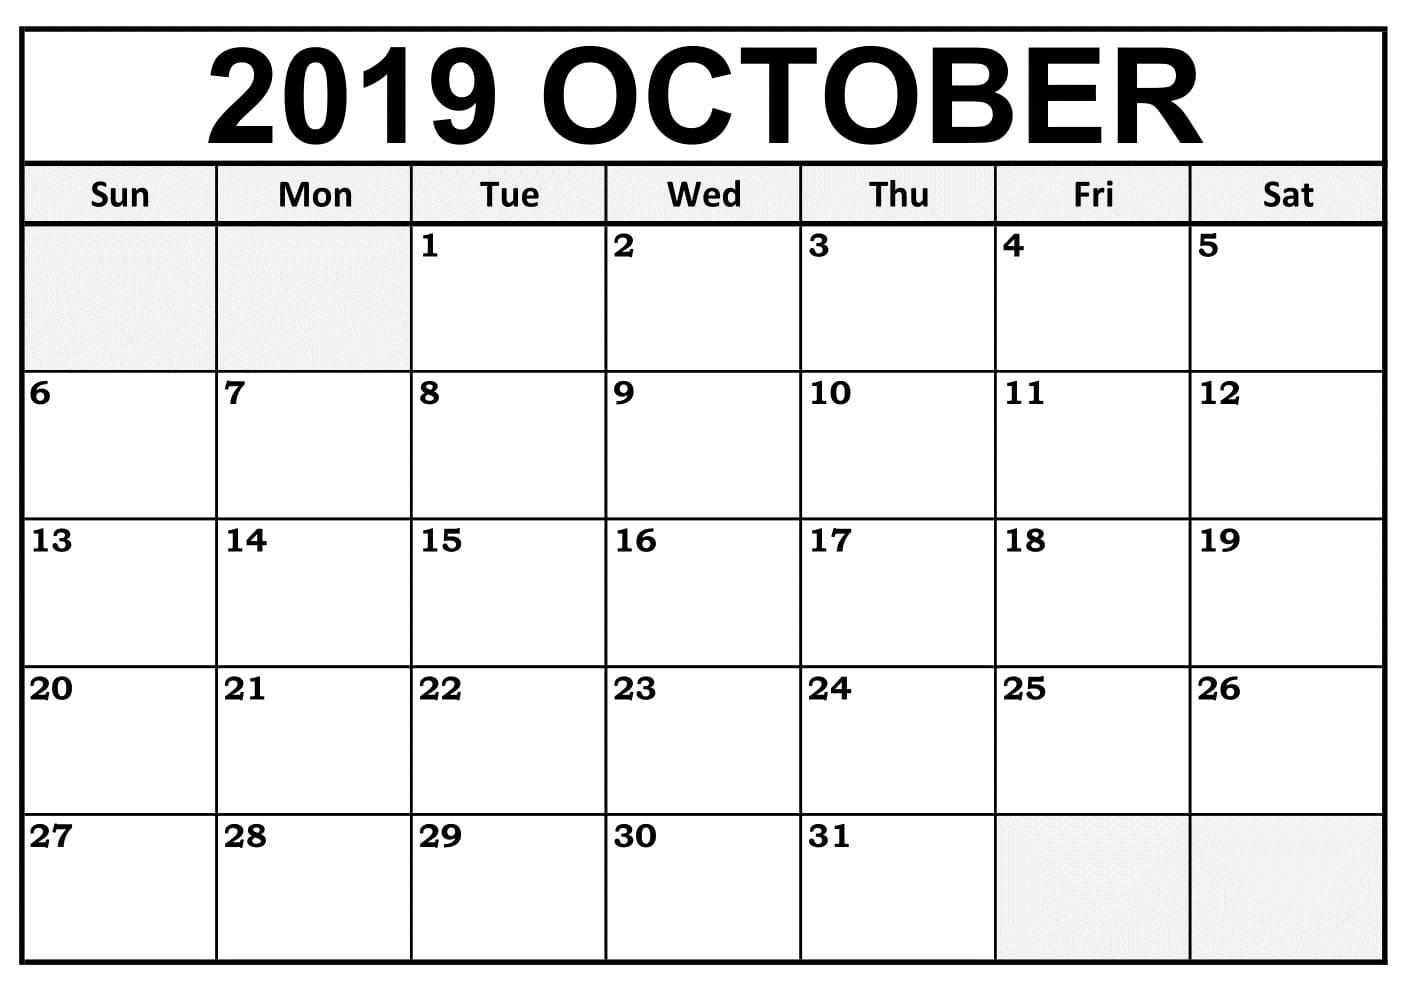 October 2019 Calendar Template For Kids Free Printable